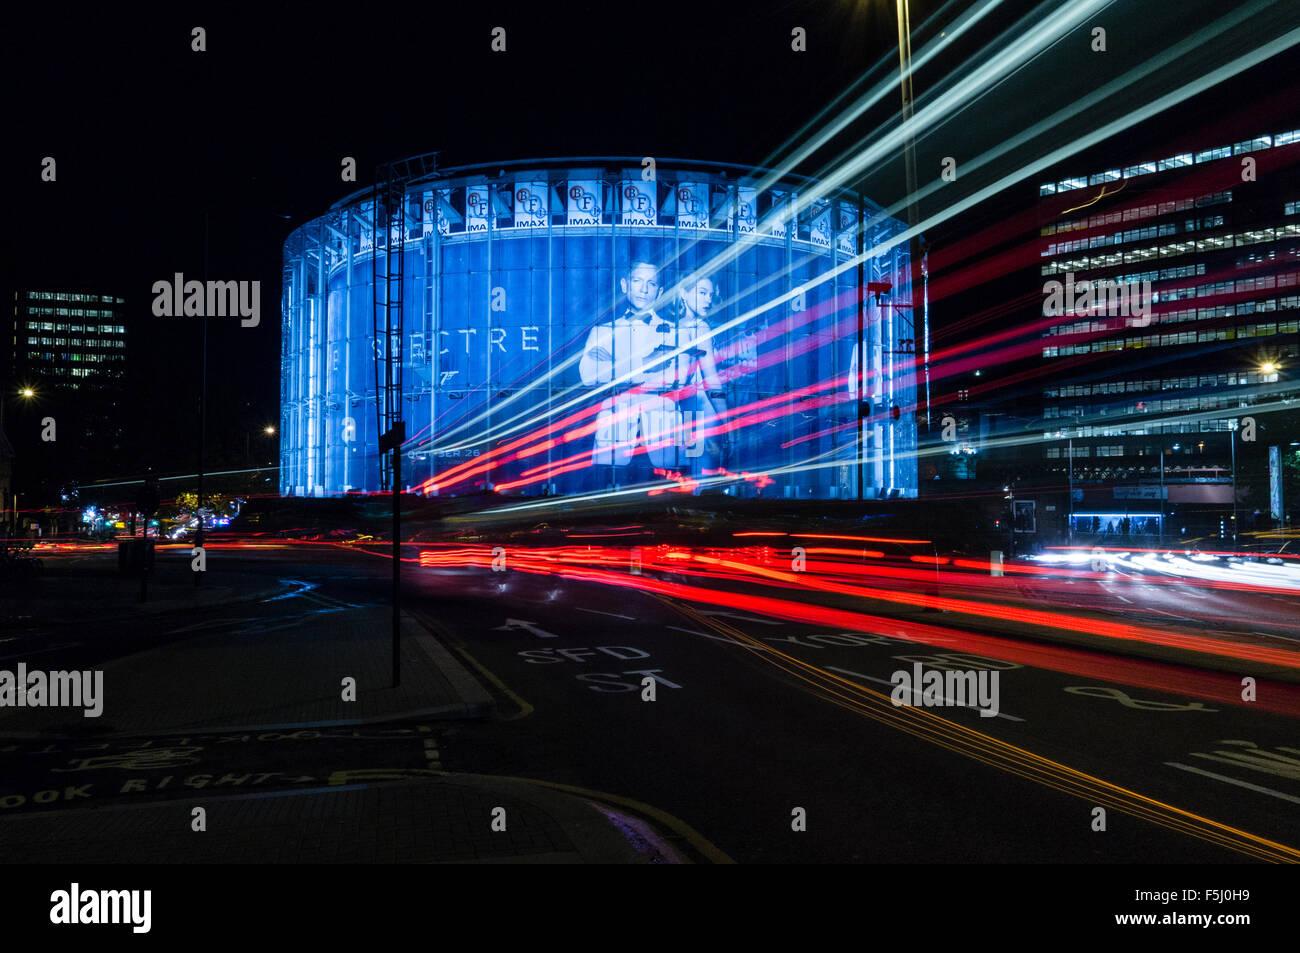 Light Trail, BFI IMAX cinema, Waterloo, London, UK - Stock Image